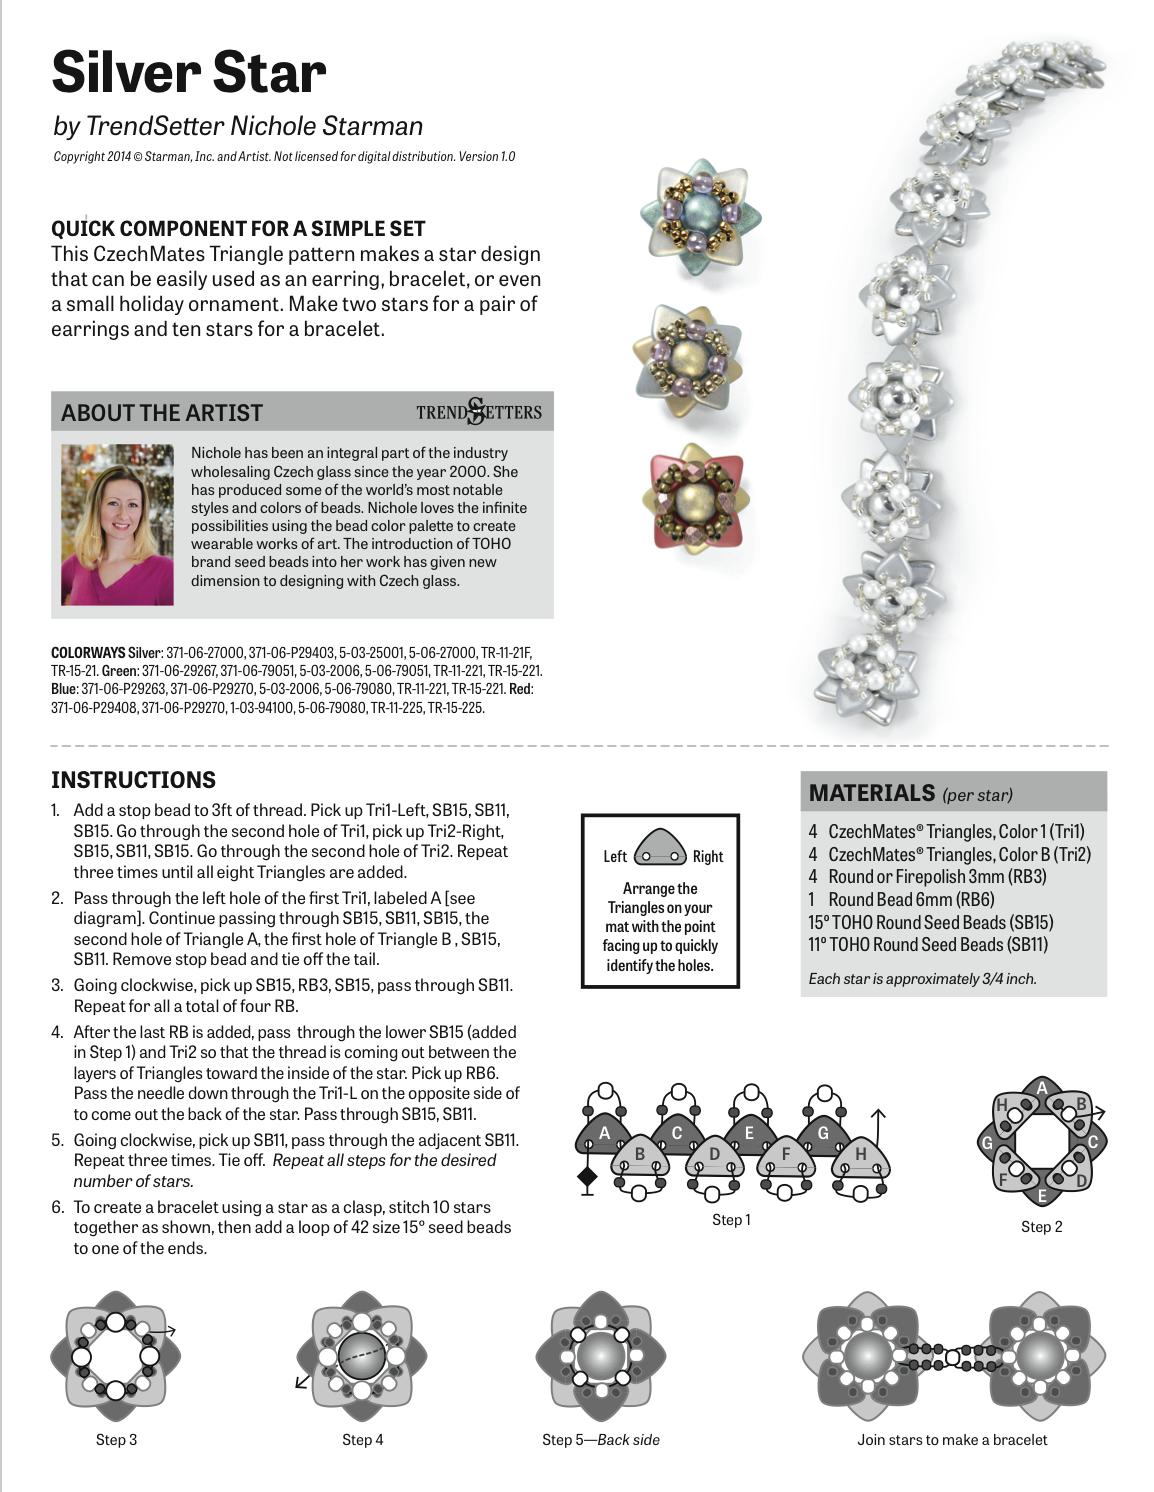 Beads _ FREE Pattern - Bracelet _ Silver Star _ Artist - Nichole Starman _ CzechMates Triangles + 3mm Rds + 6mm Rd + 11o &15o SBs _* Star / Fower Motif *